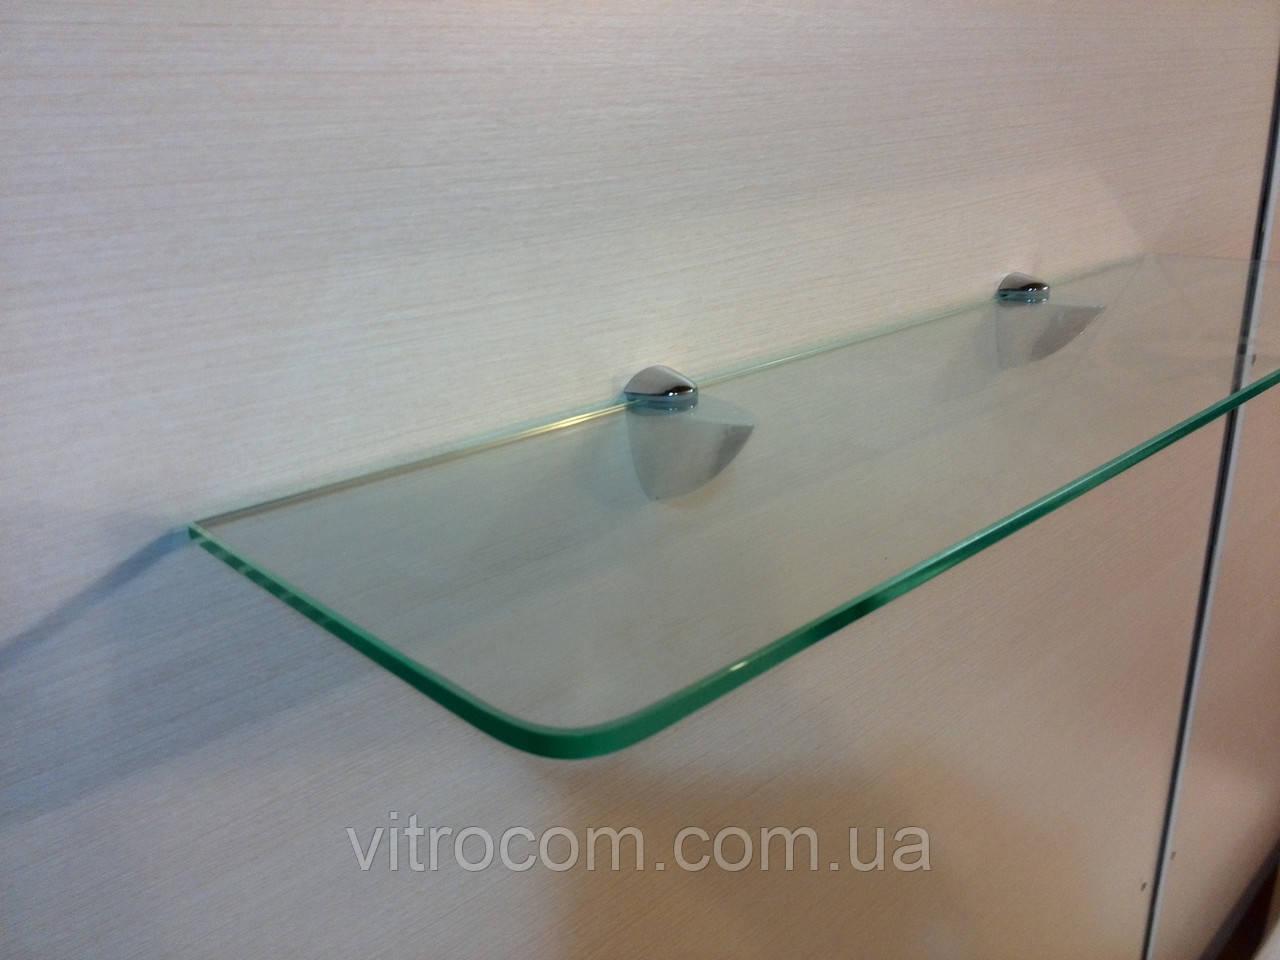 Полка стеклянная прямая прозрачная 5 мм 40 х 15 см